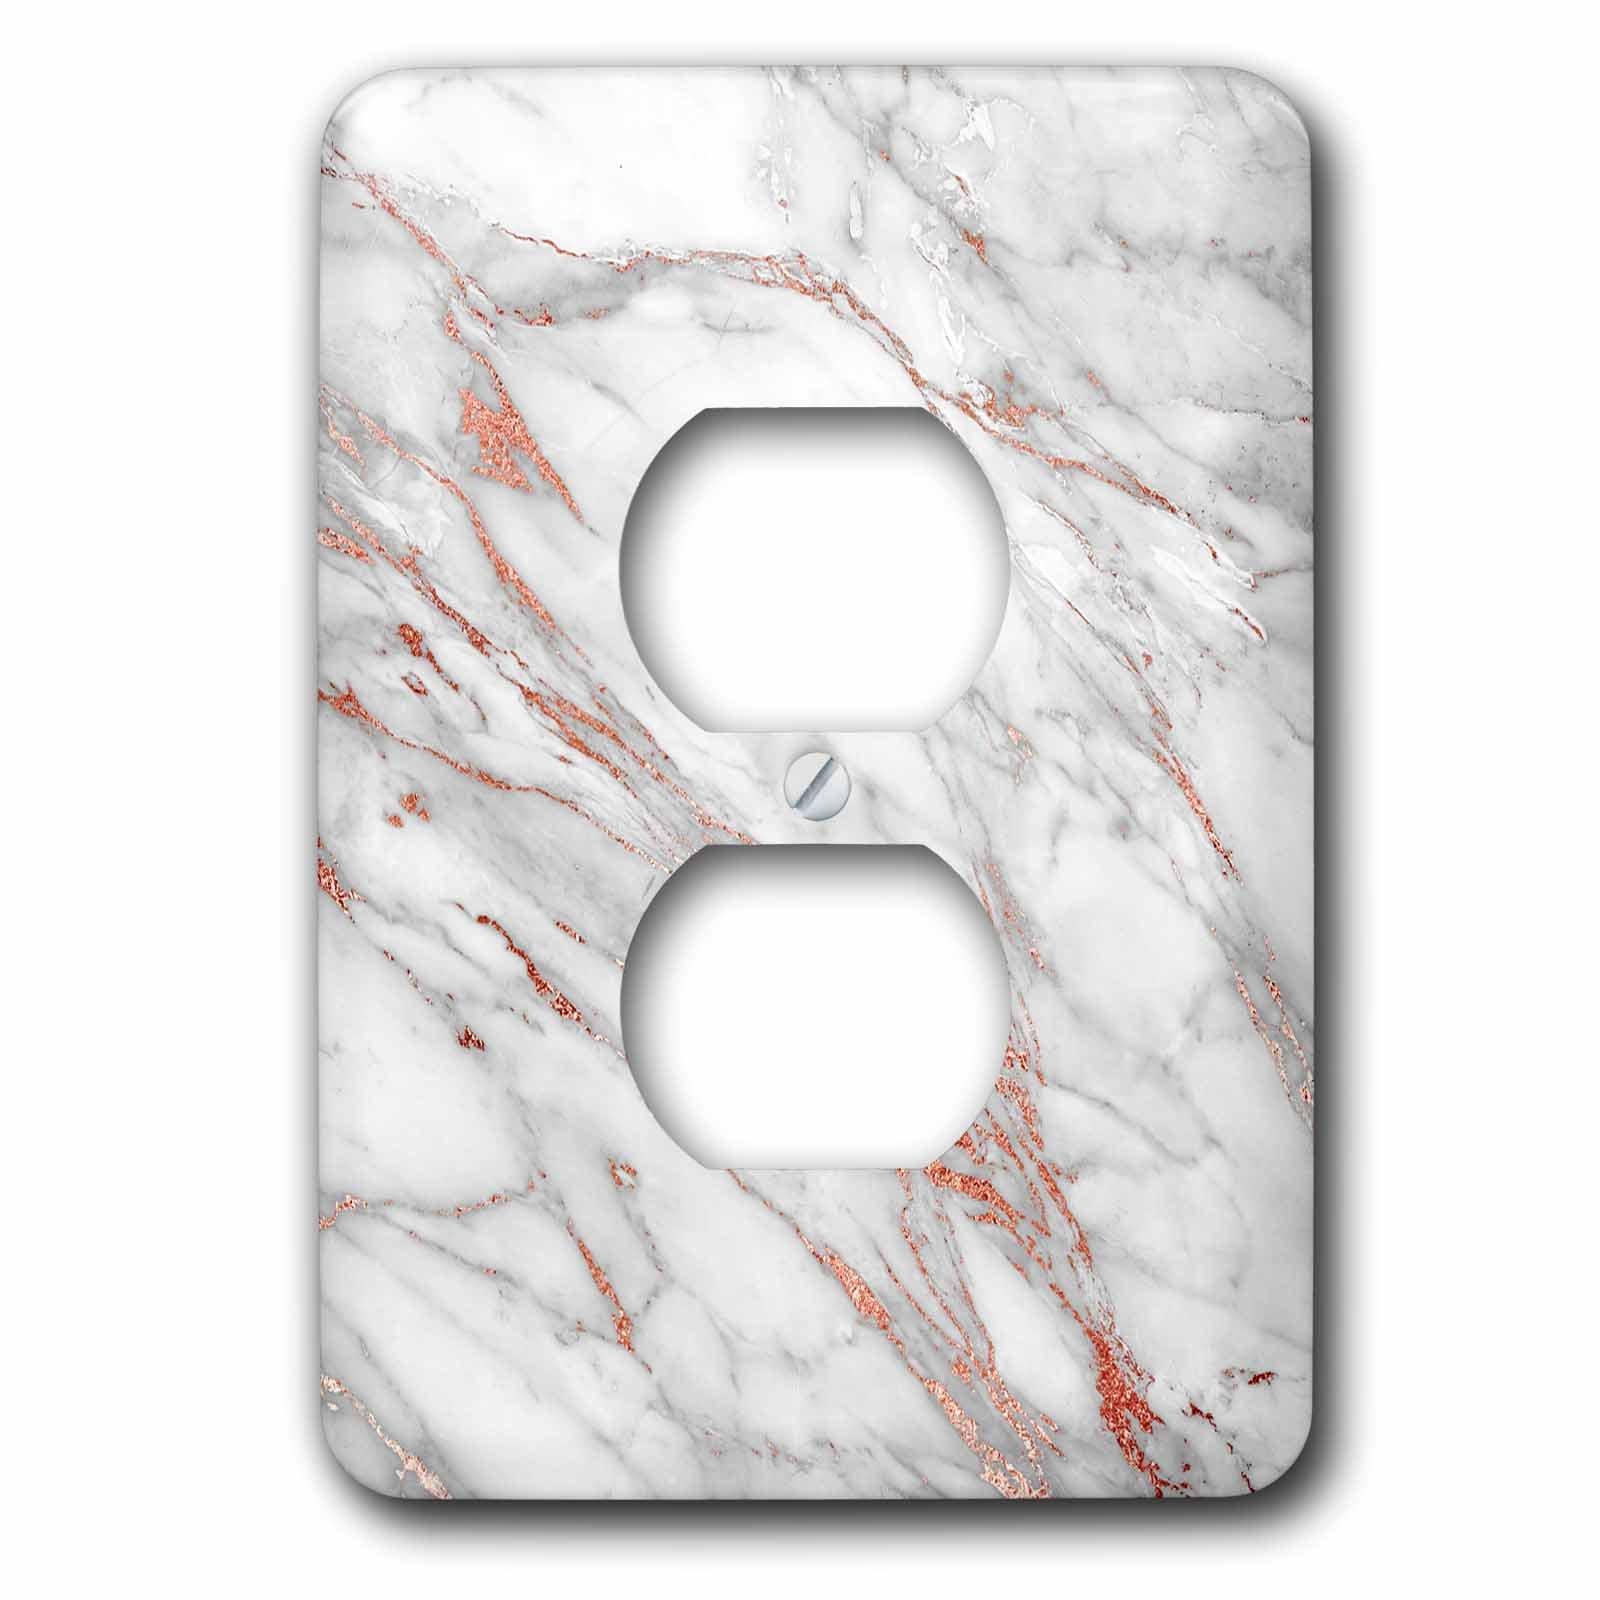 3dRose Uta Naumann Faux Glitter Pattern - Luxury Grey Copper Gem Stone Marble Glitter Metallic Faux Print - Light Switch Covers - 2 plug outlet cover (lsp_268836_6)